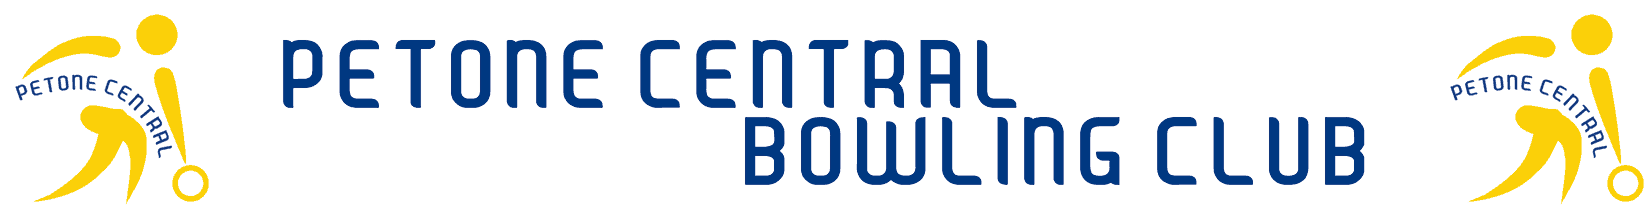 Petone Central Bowling Club